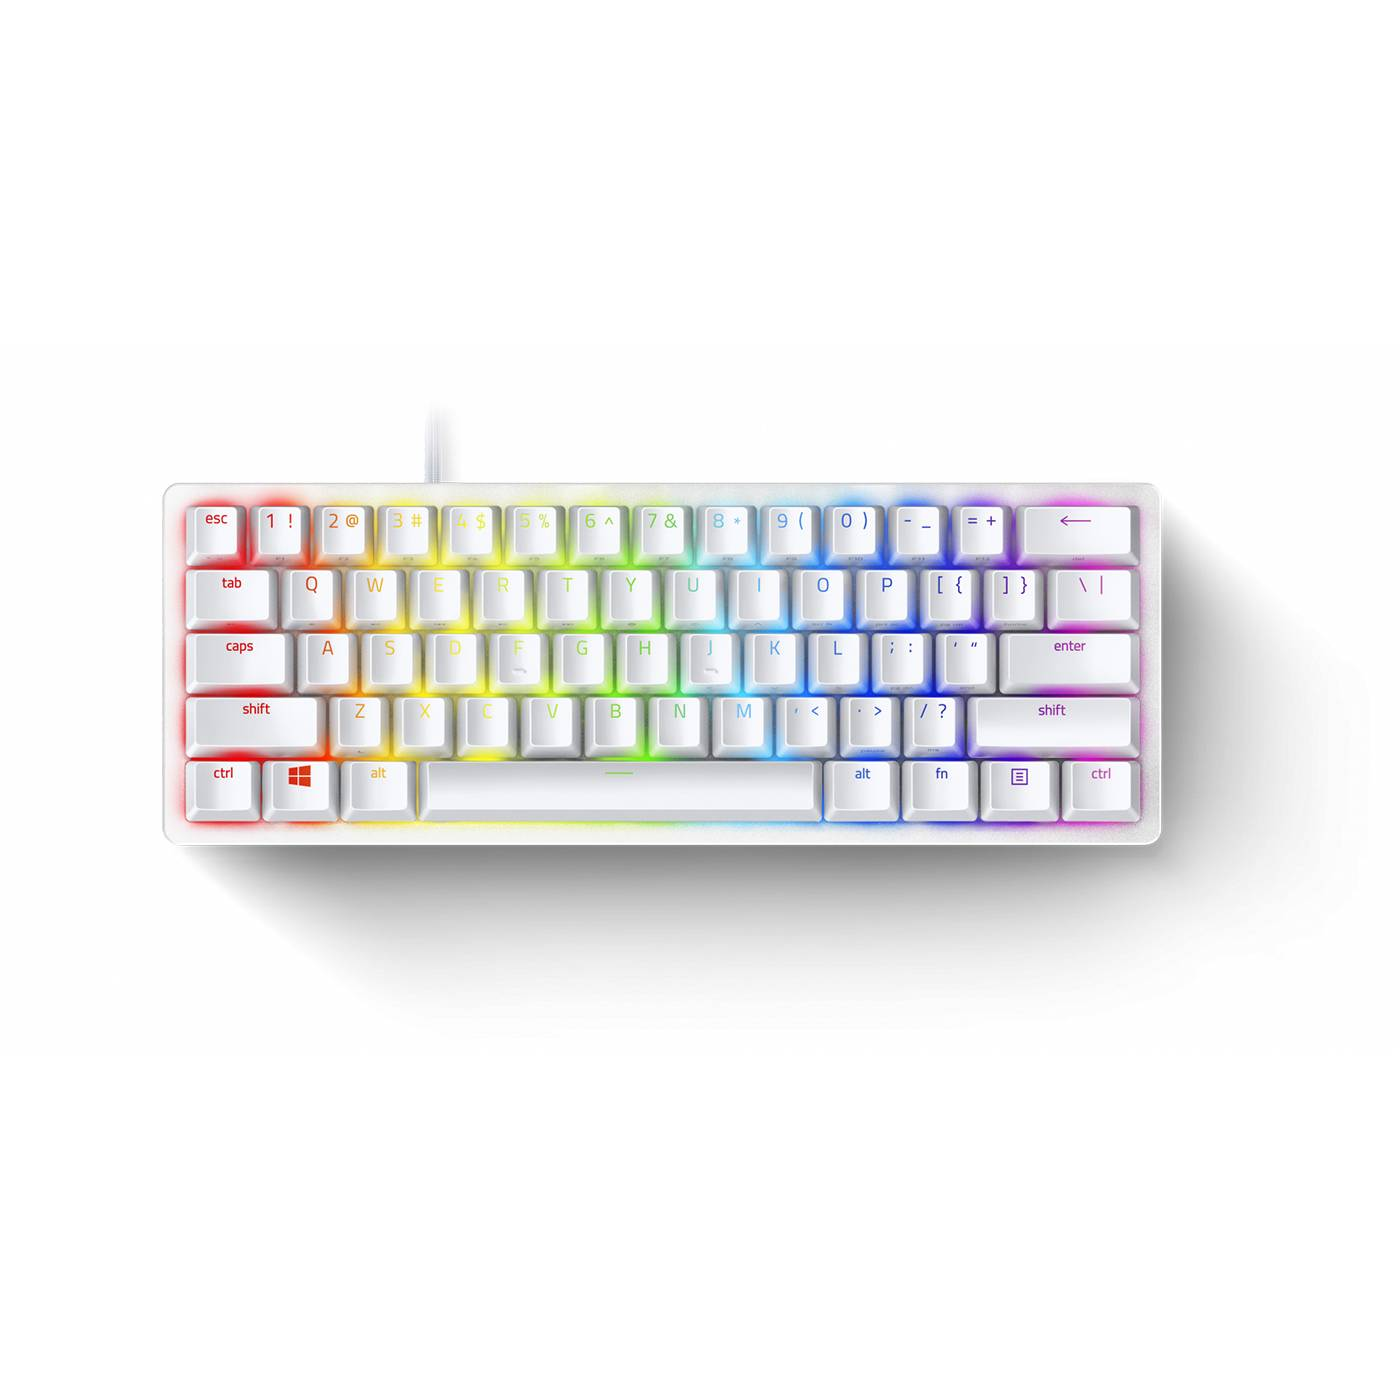 Razer HUNTSMAN MINI MERCURY ED. - 60% Linear Red Opto Mechanical Switch Gaming Keyboard  - US Layout